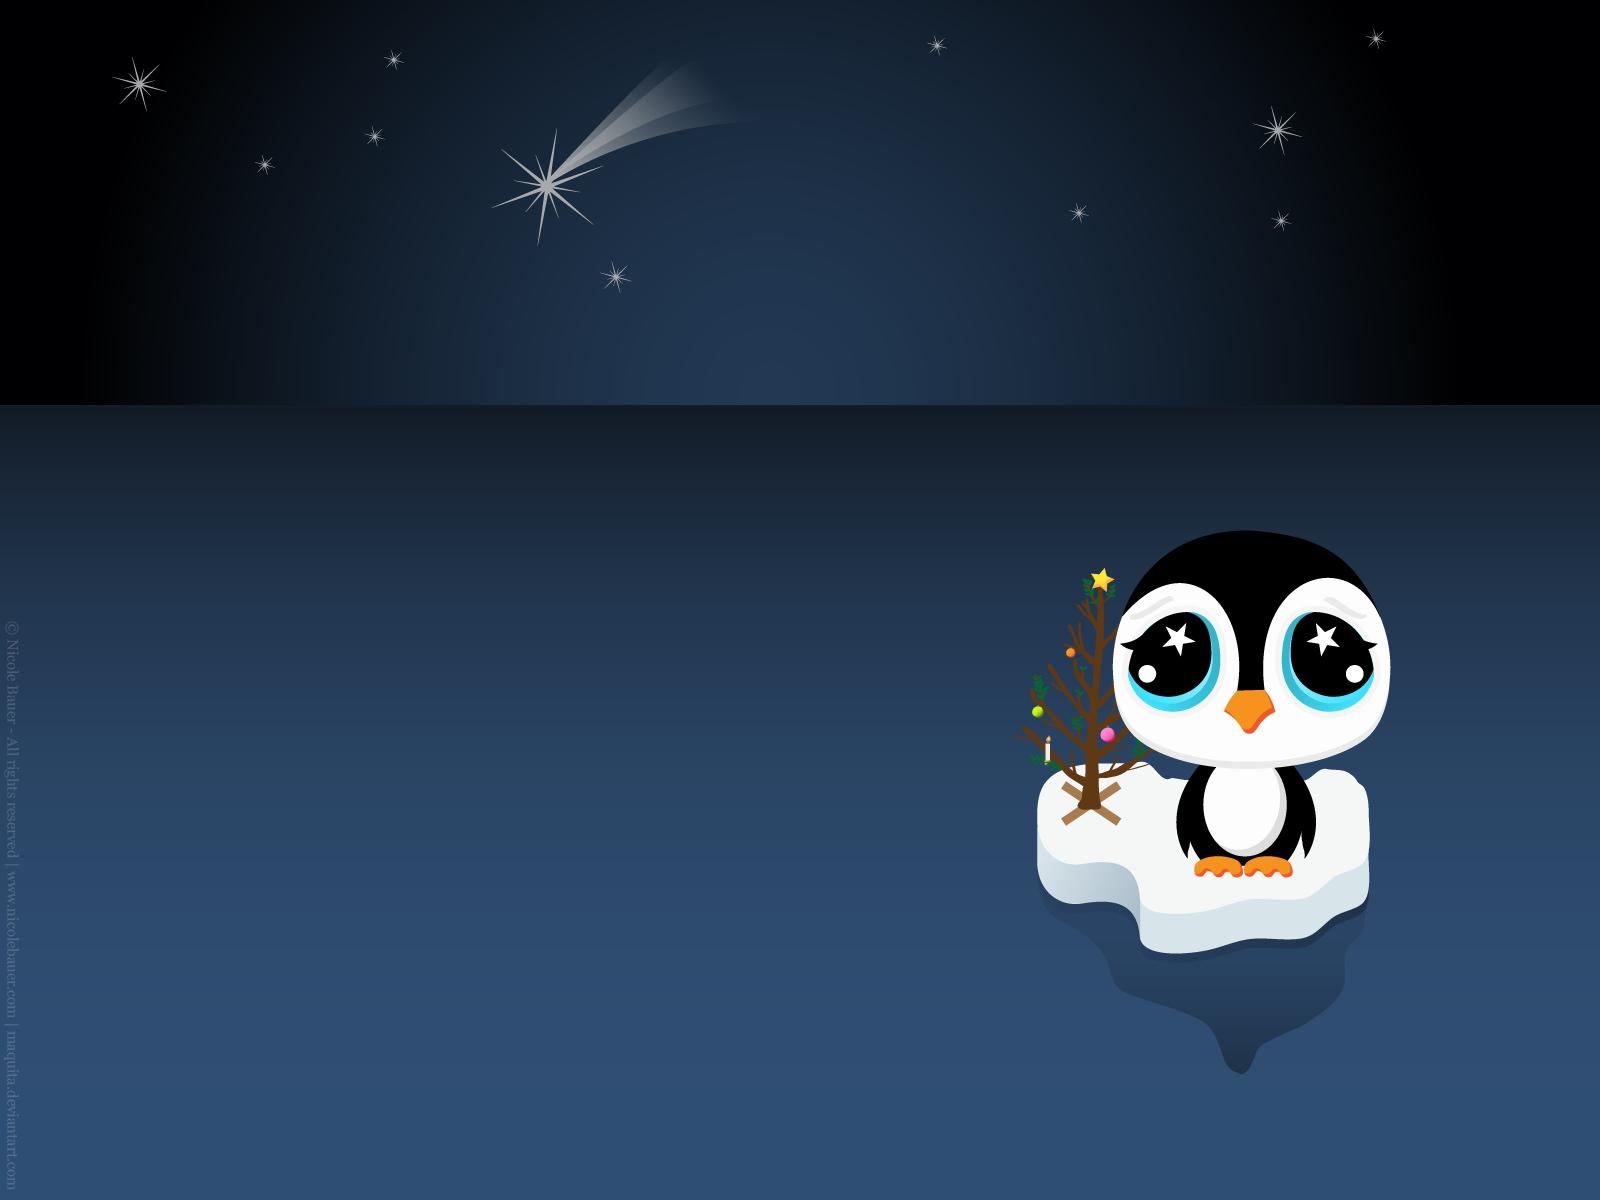 Cute Cartoon Christmas Wallpaper 9824 Hd Wallpapers in Celebrations 1600x1200